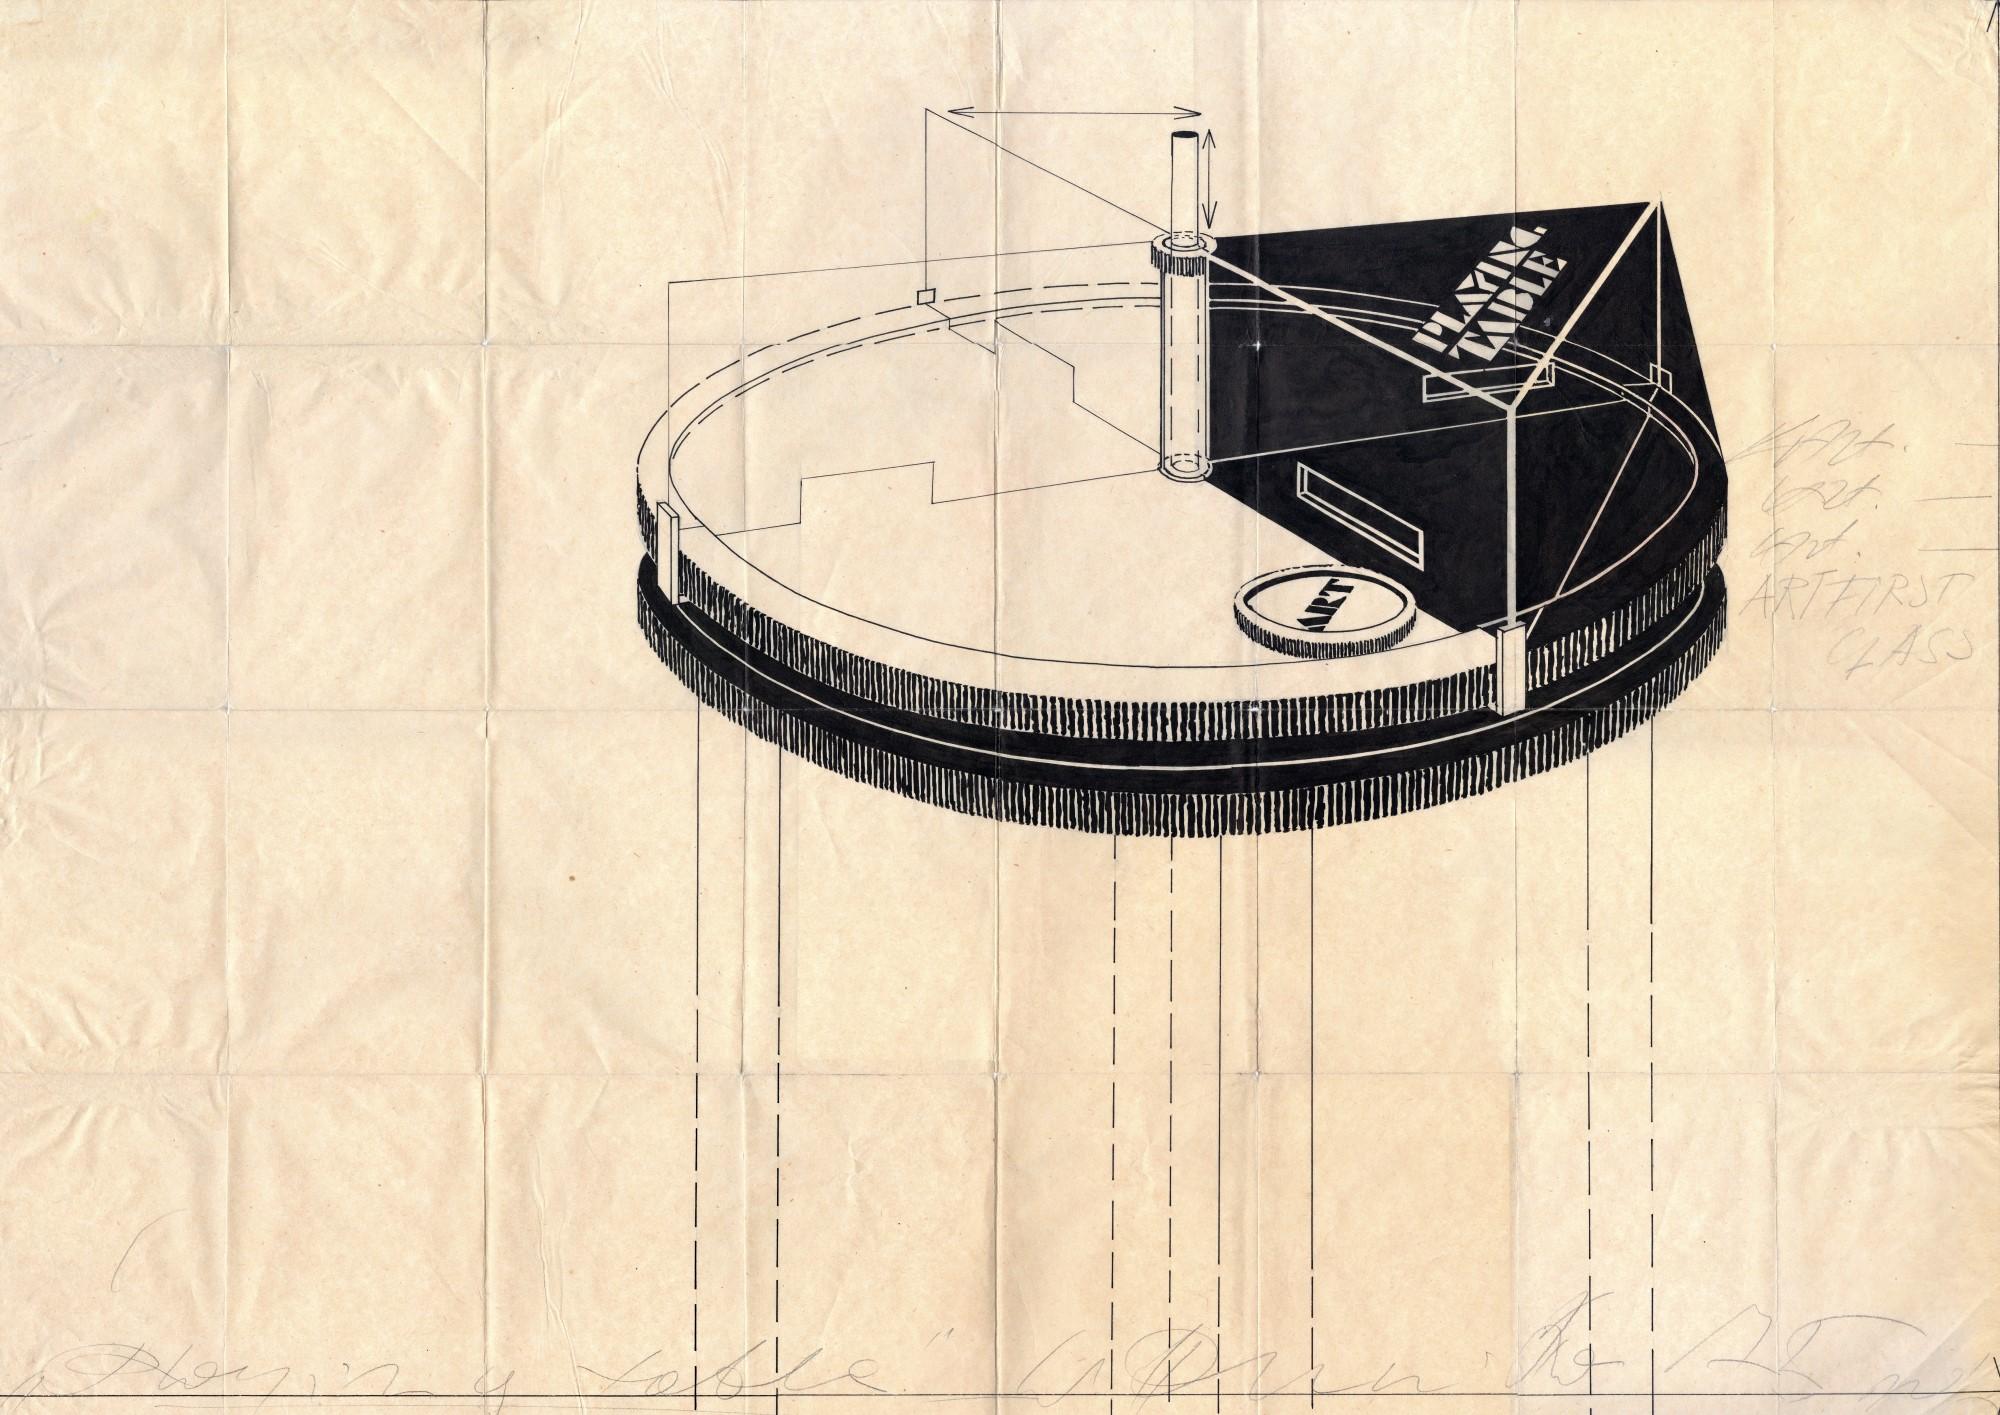 Wincenty_Dunikowski_Duniko_Art_Playing_Table_1975